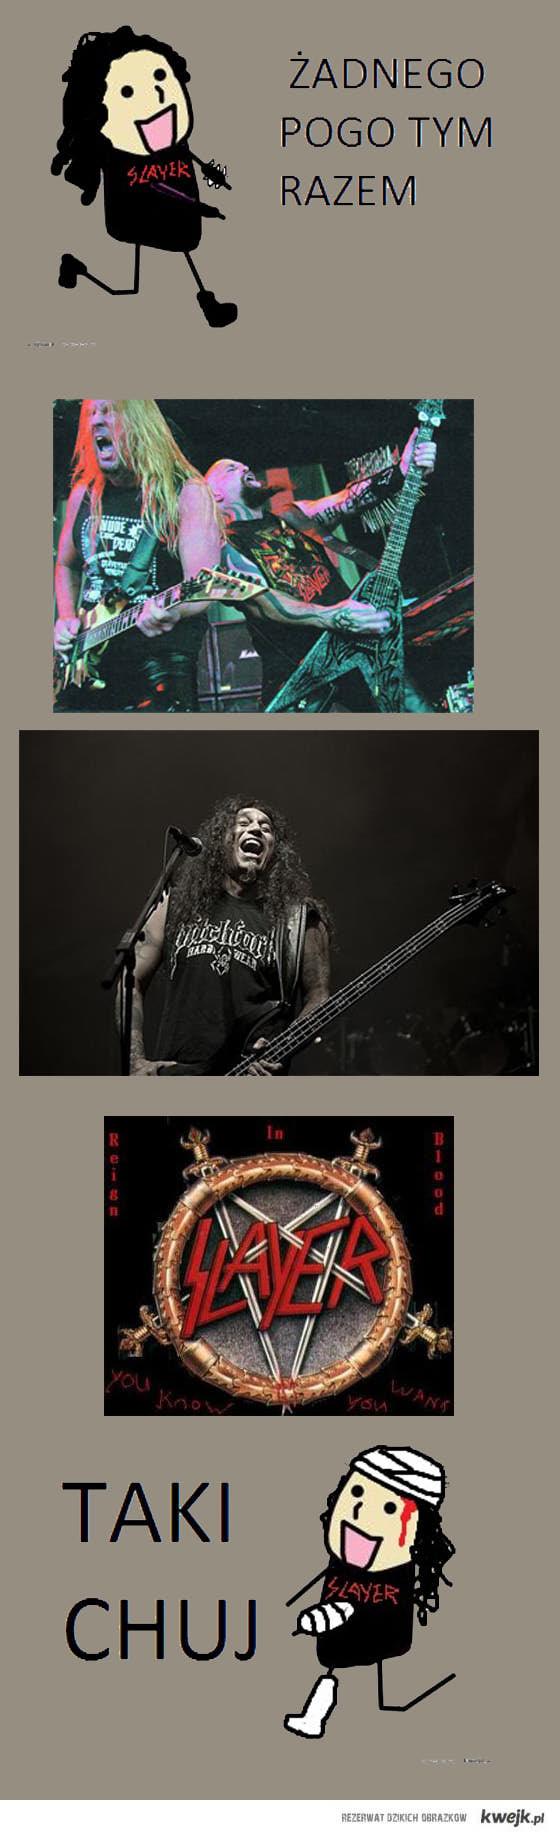 Slayer w piątek :D